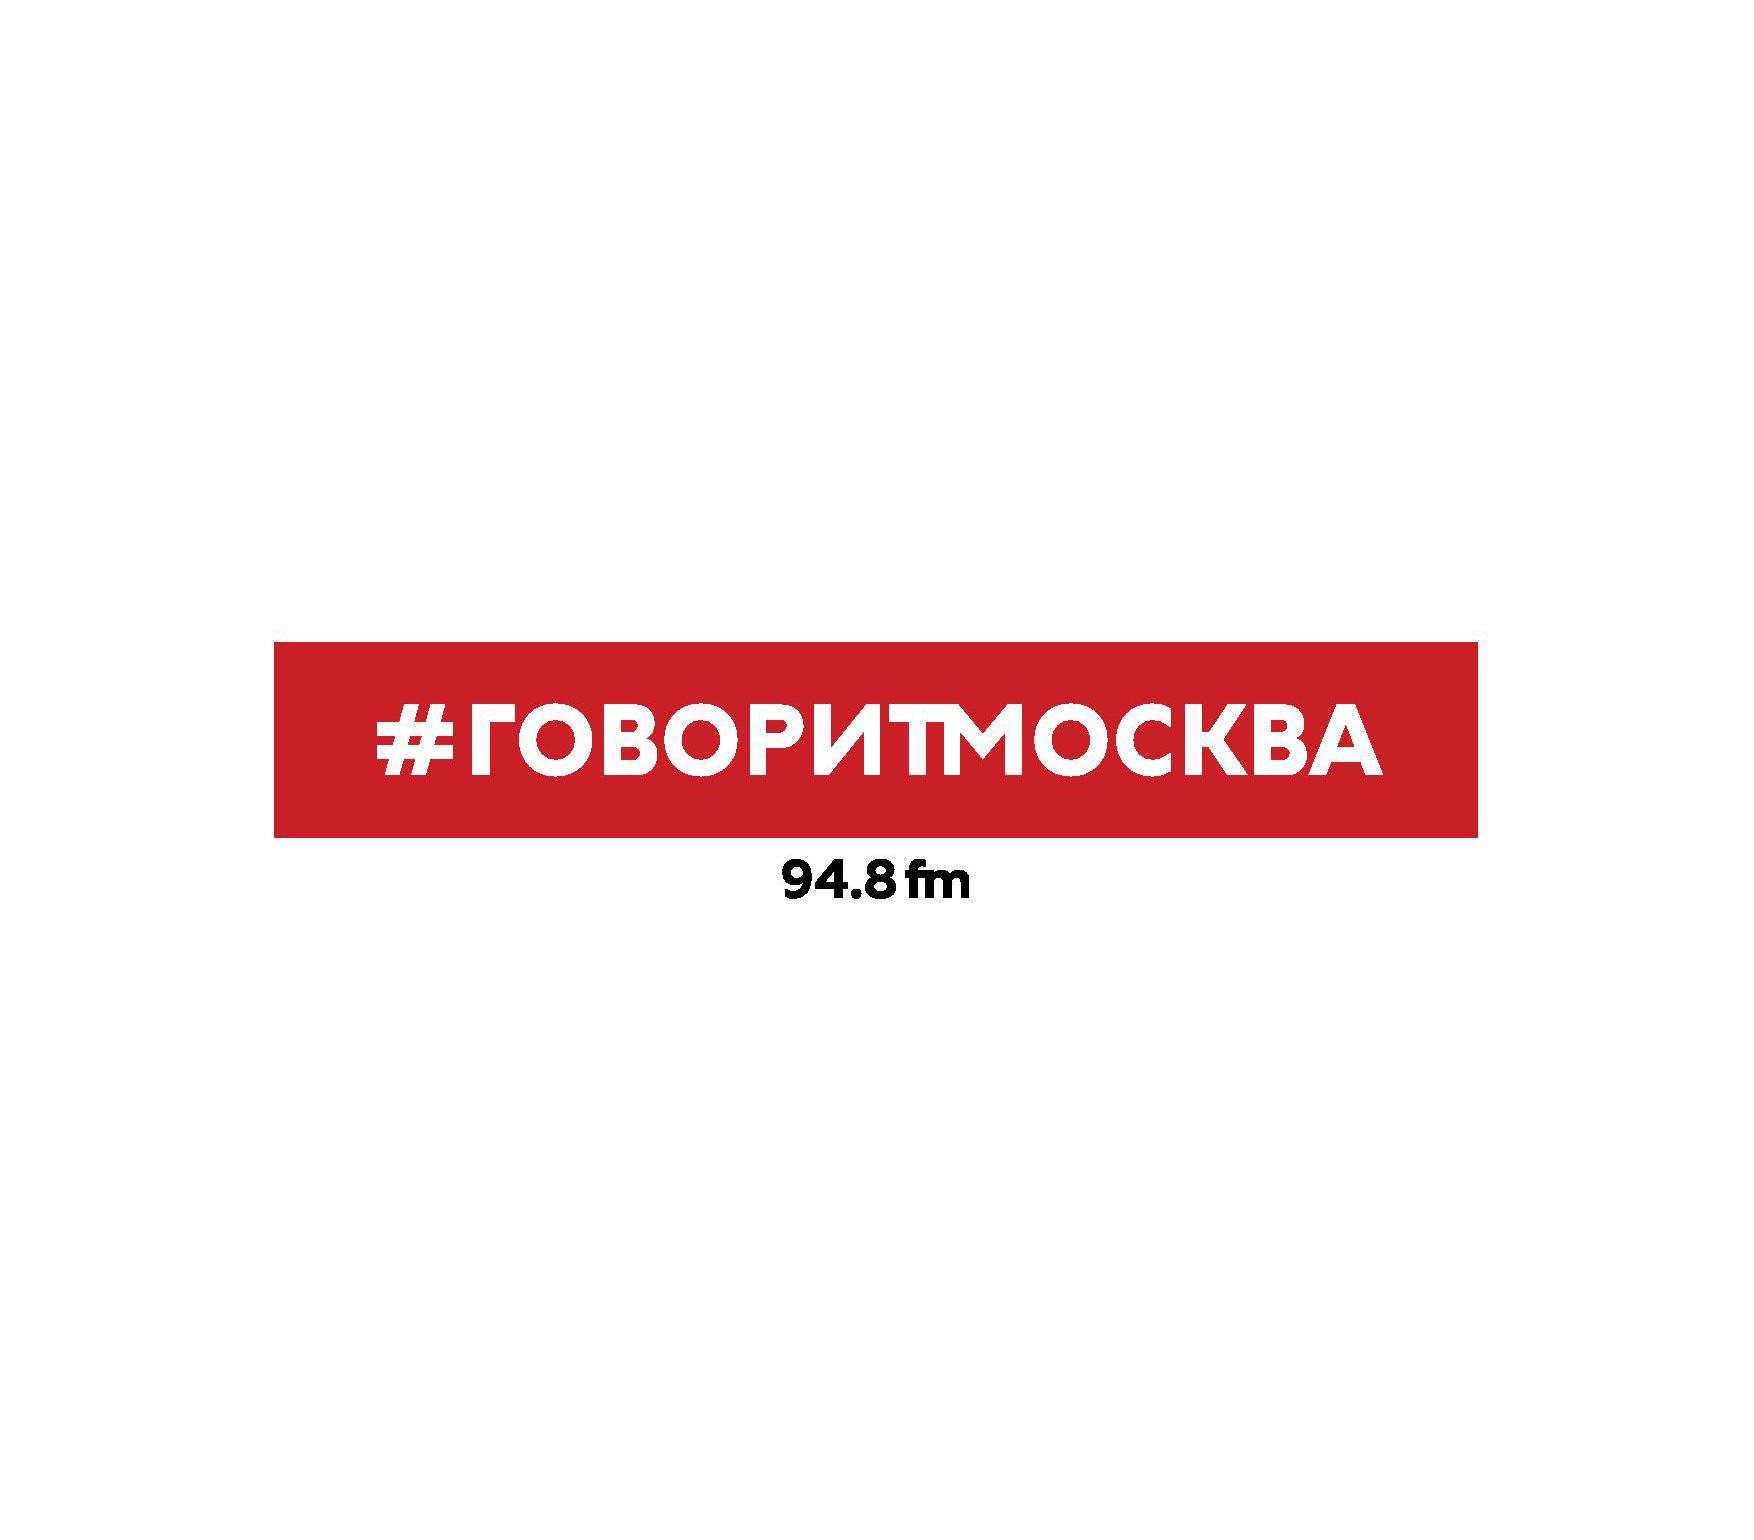 Юрий Никифоров День памяти жертв фашизма юрий силантьев памяти маэстро